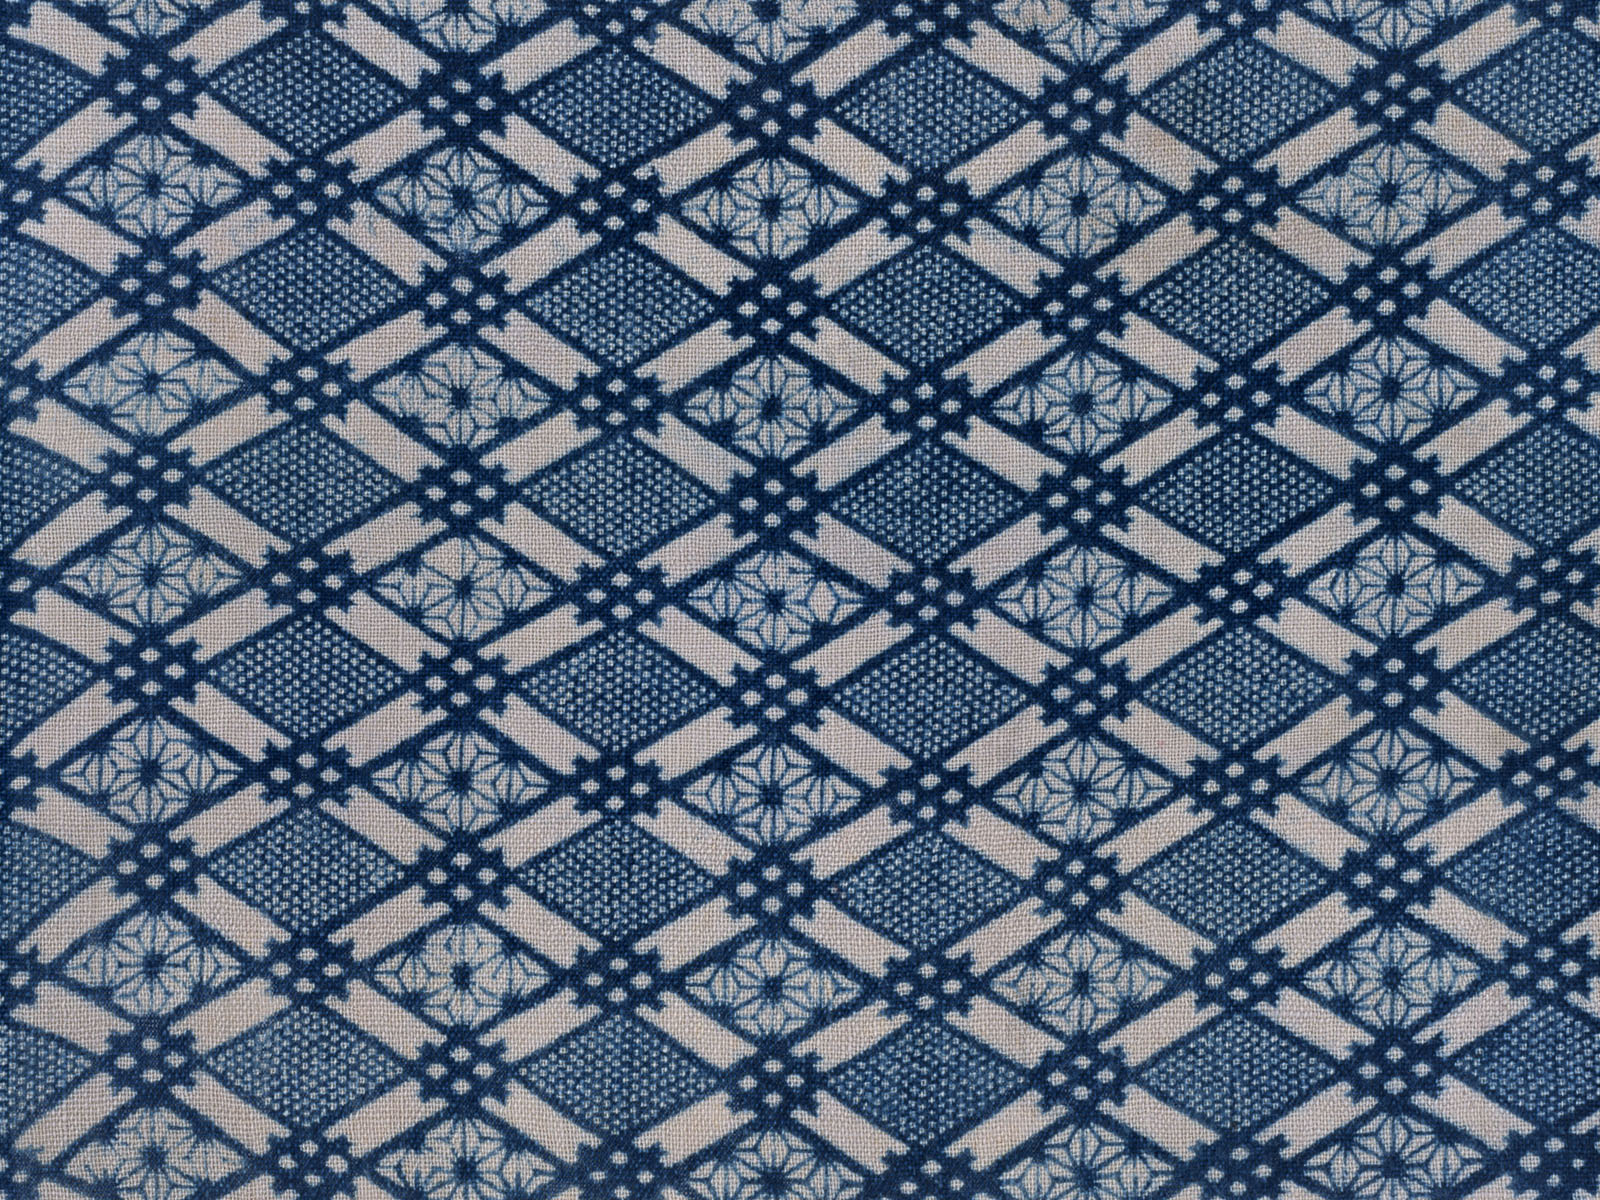 [Resim: pattern_texture1158nhsku.jpg]